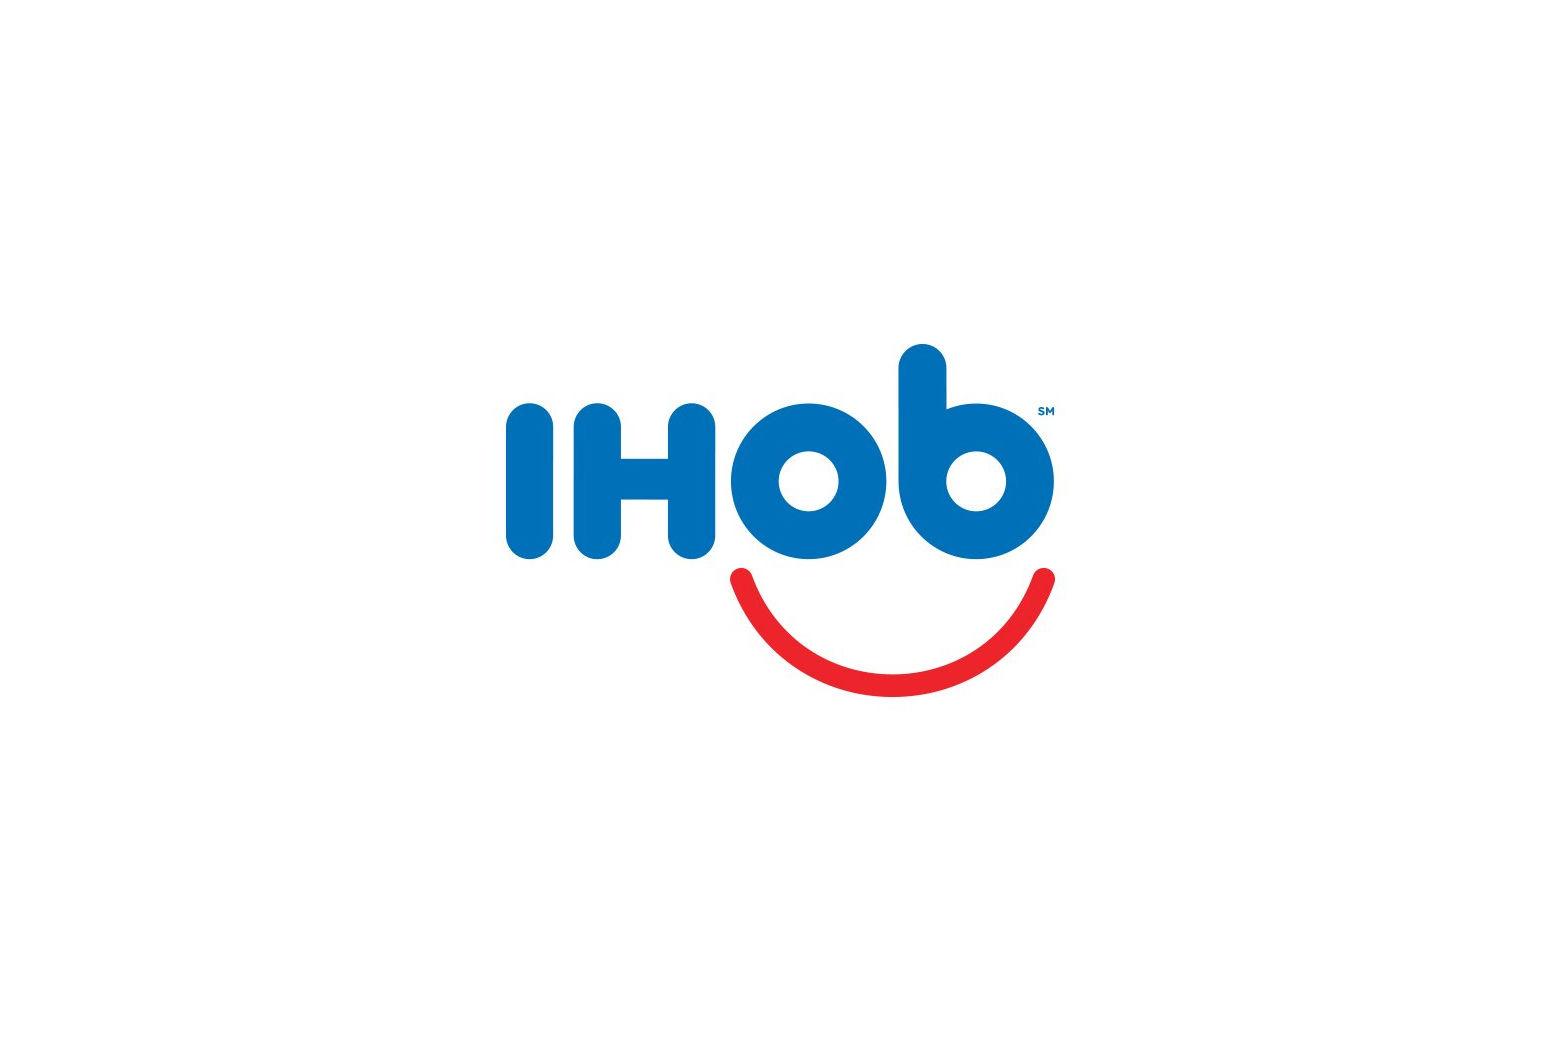 IHOP flips over burgers, changes \'p\' to \'b\' in logo.